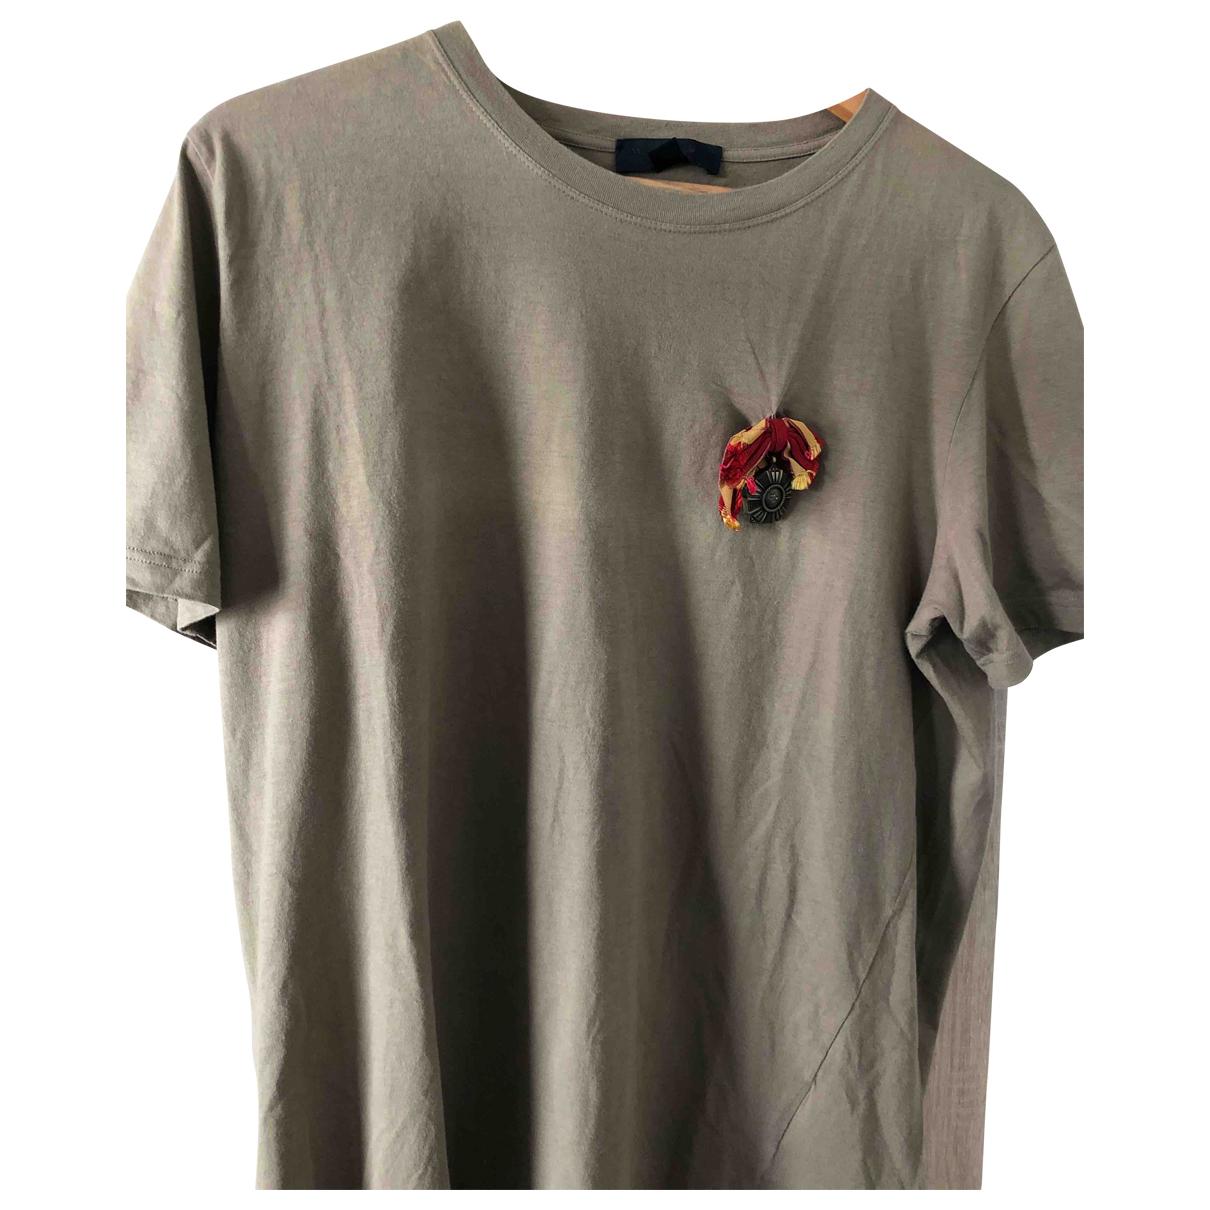 Burberry - Tee shirts   pour homme en coton - kaki